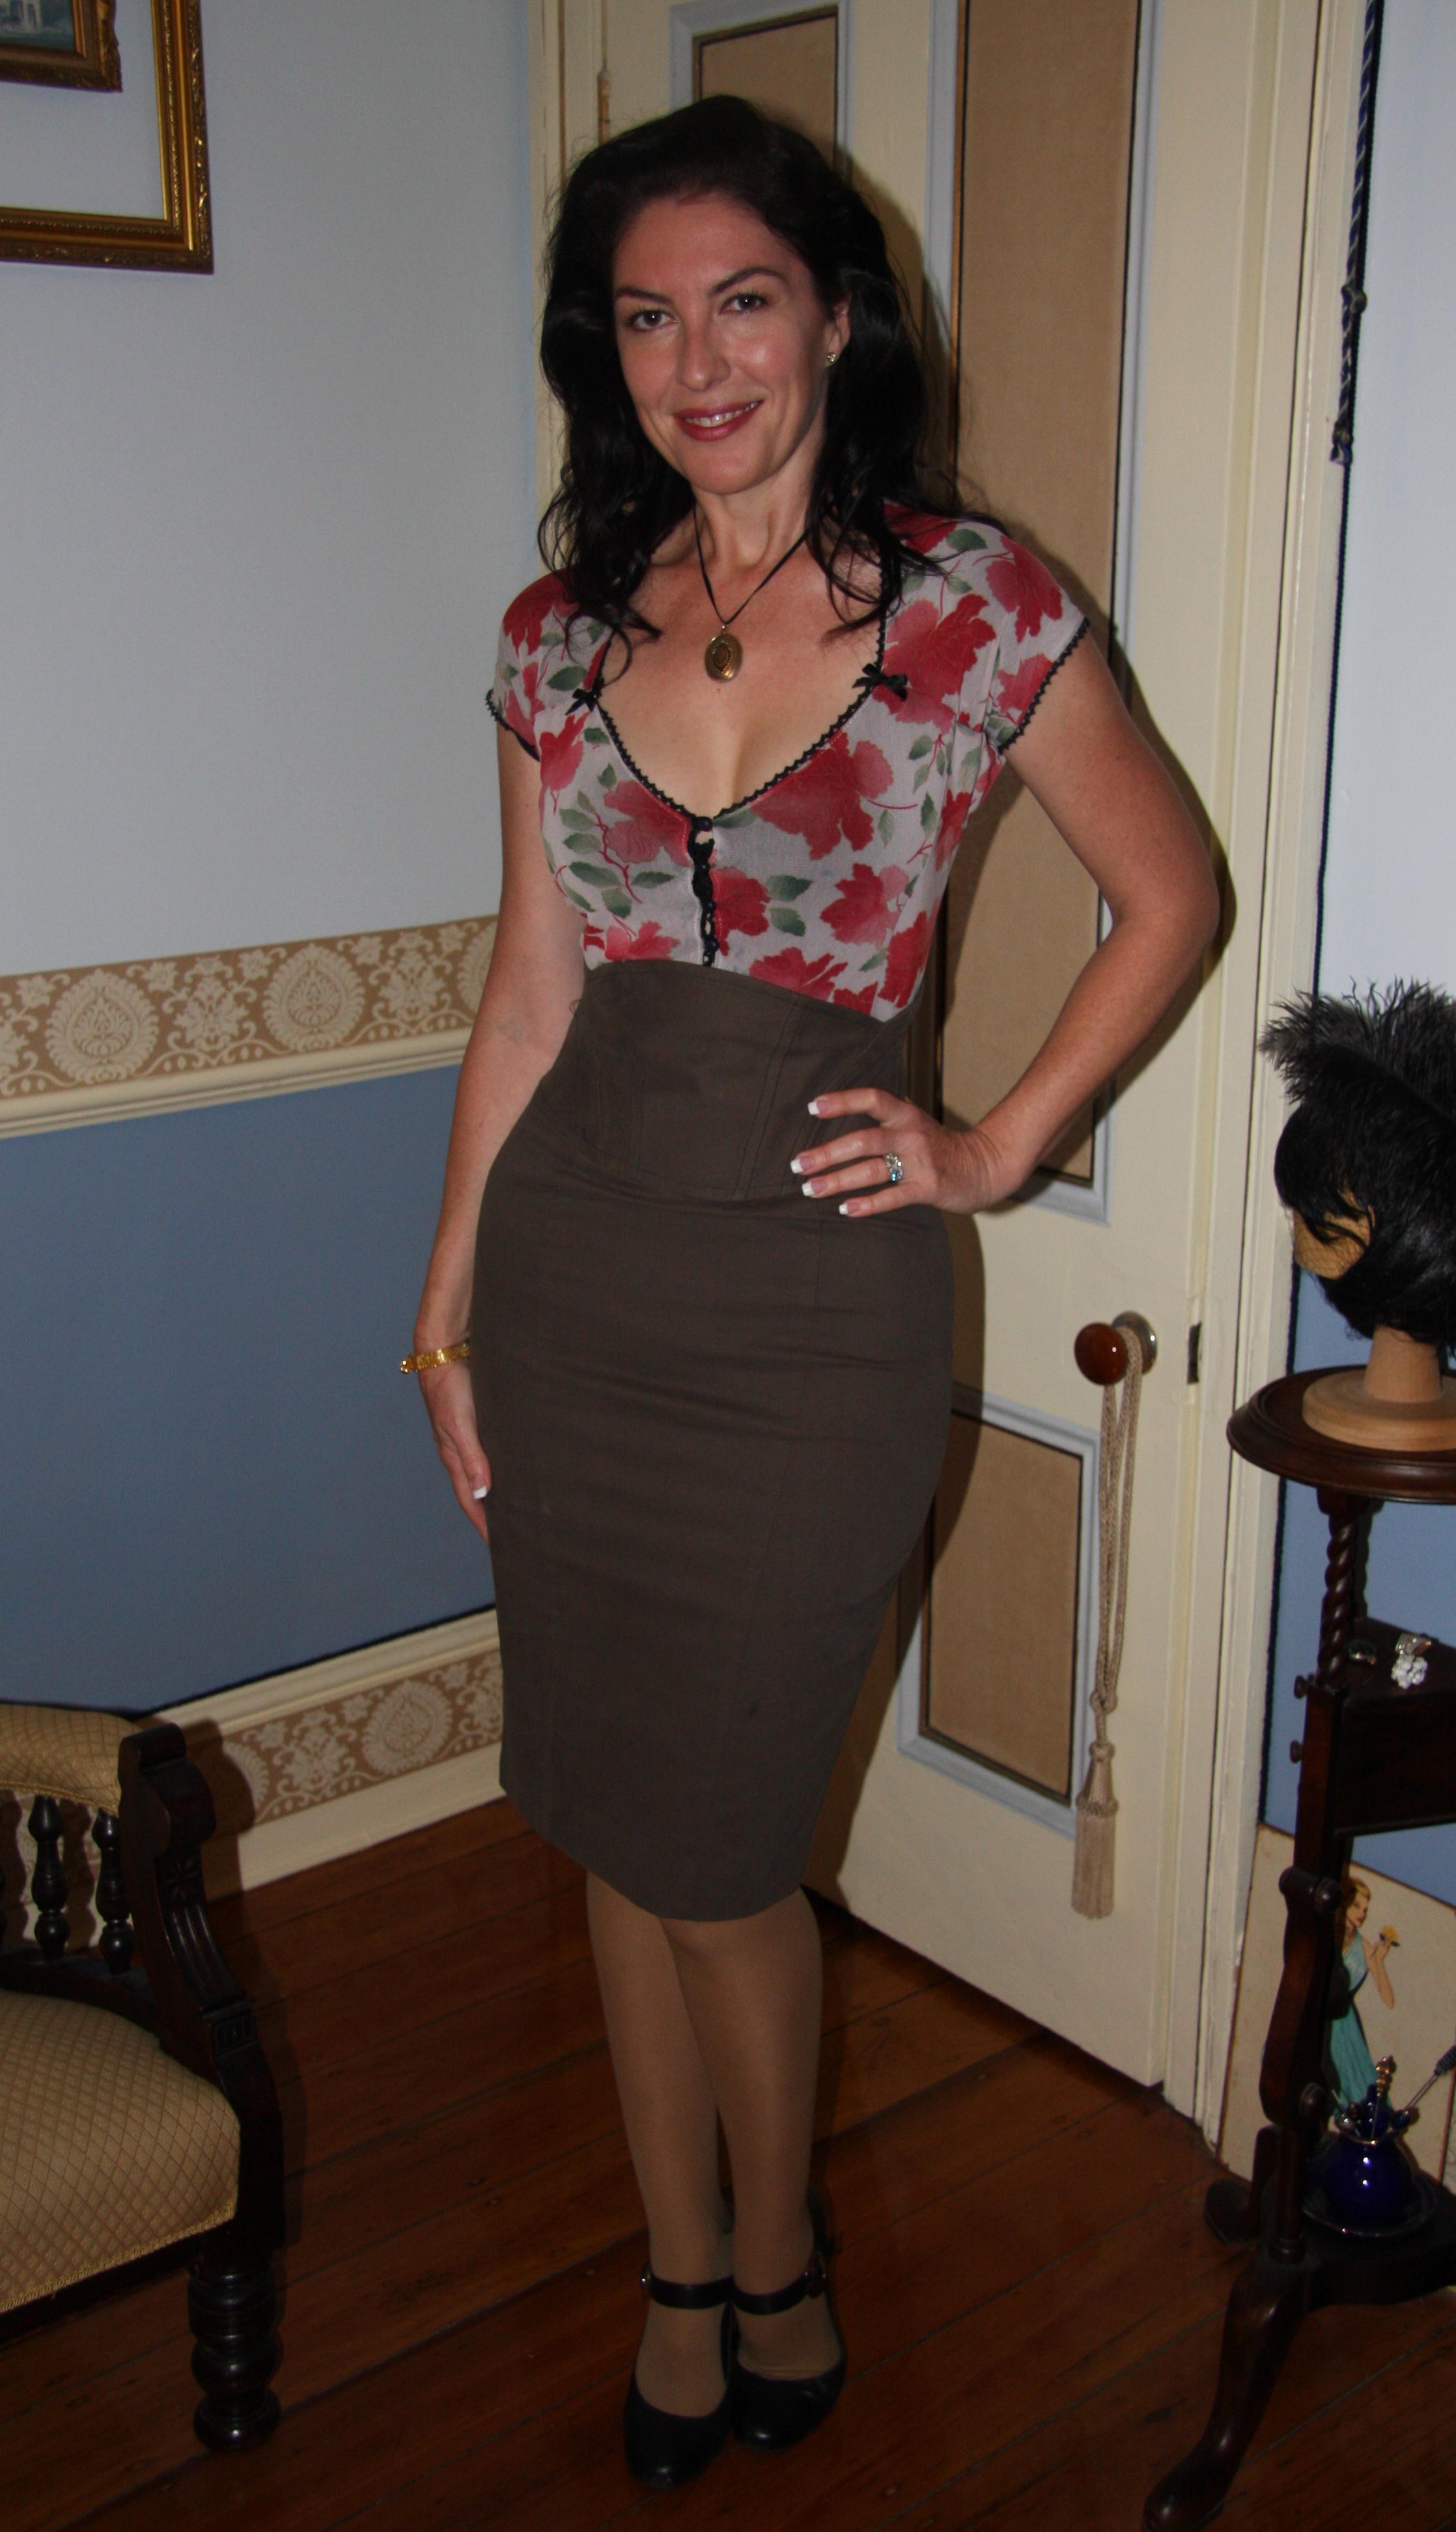 petite-mature-brunette-milf